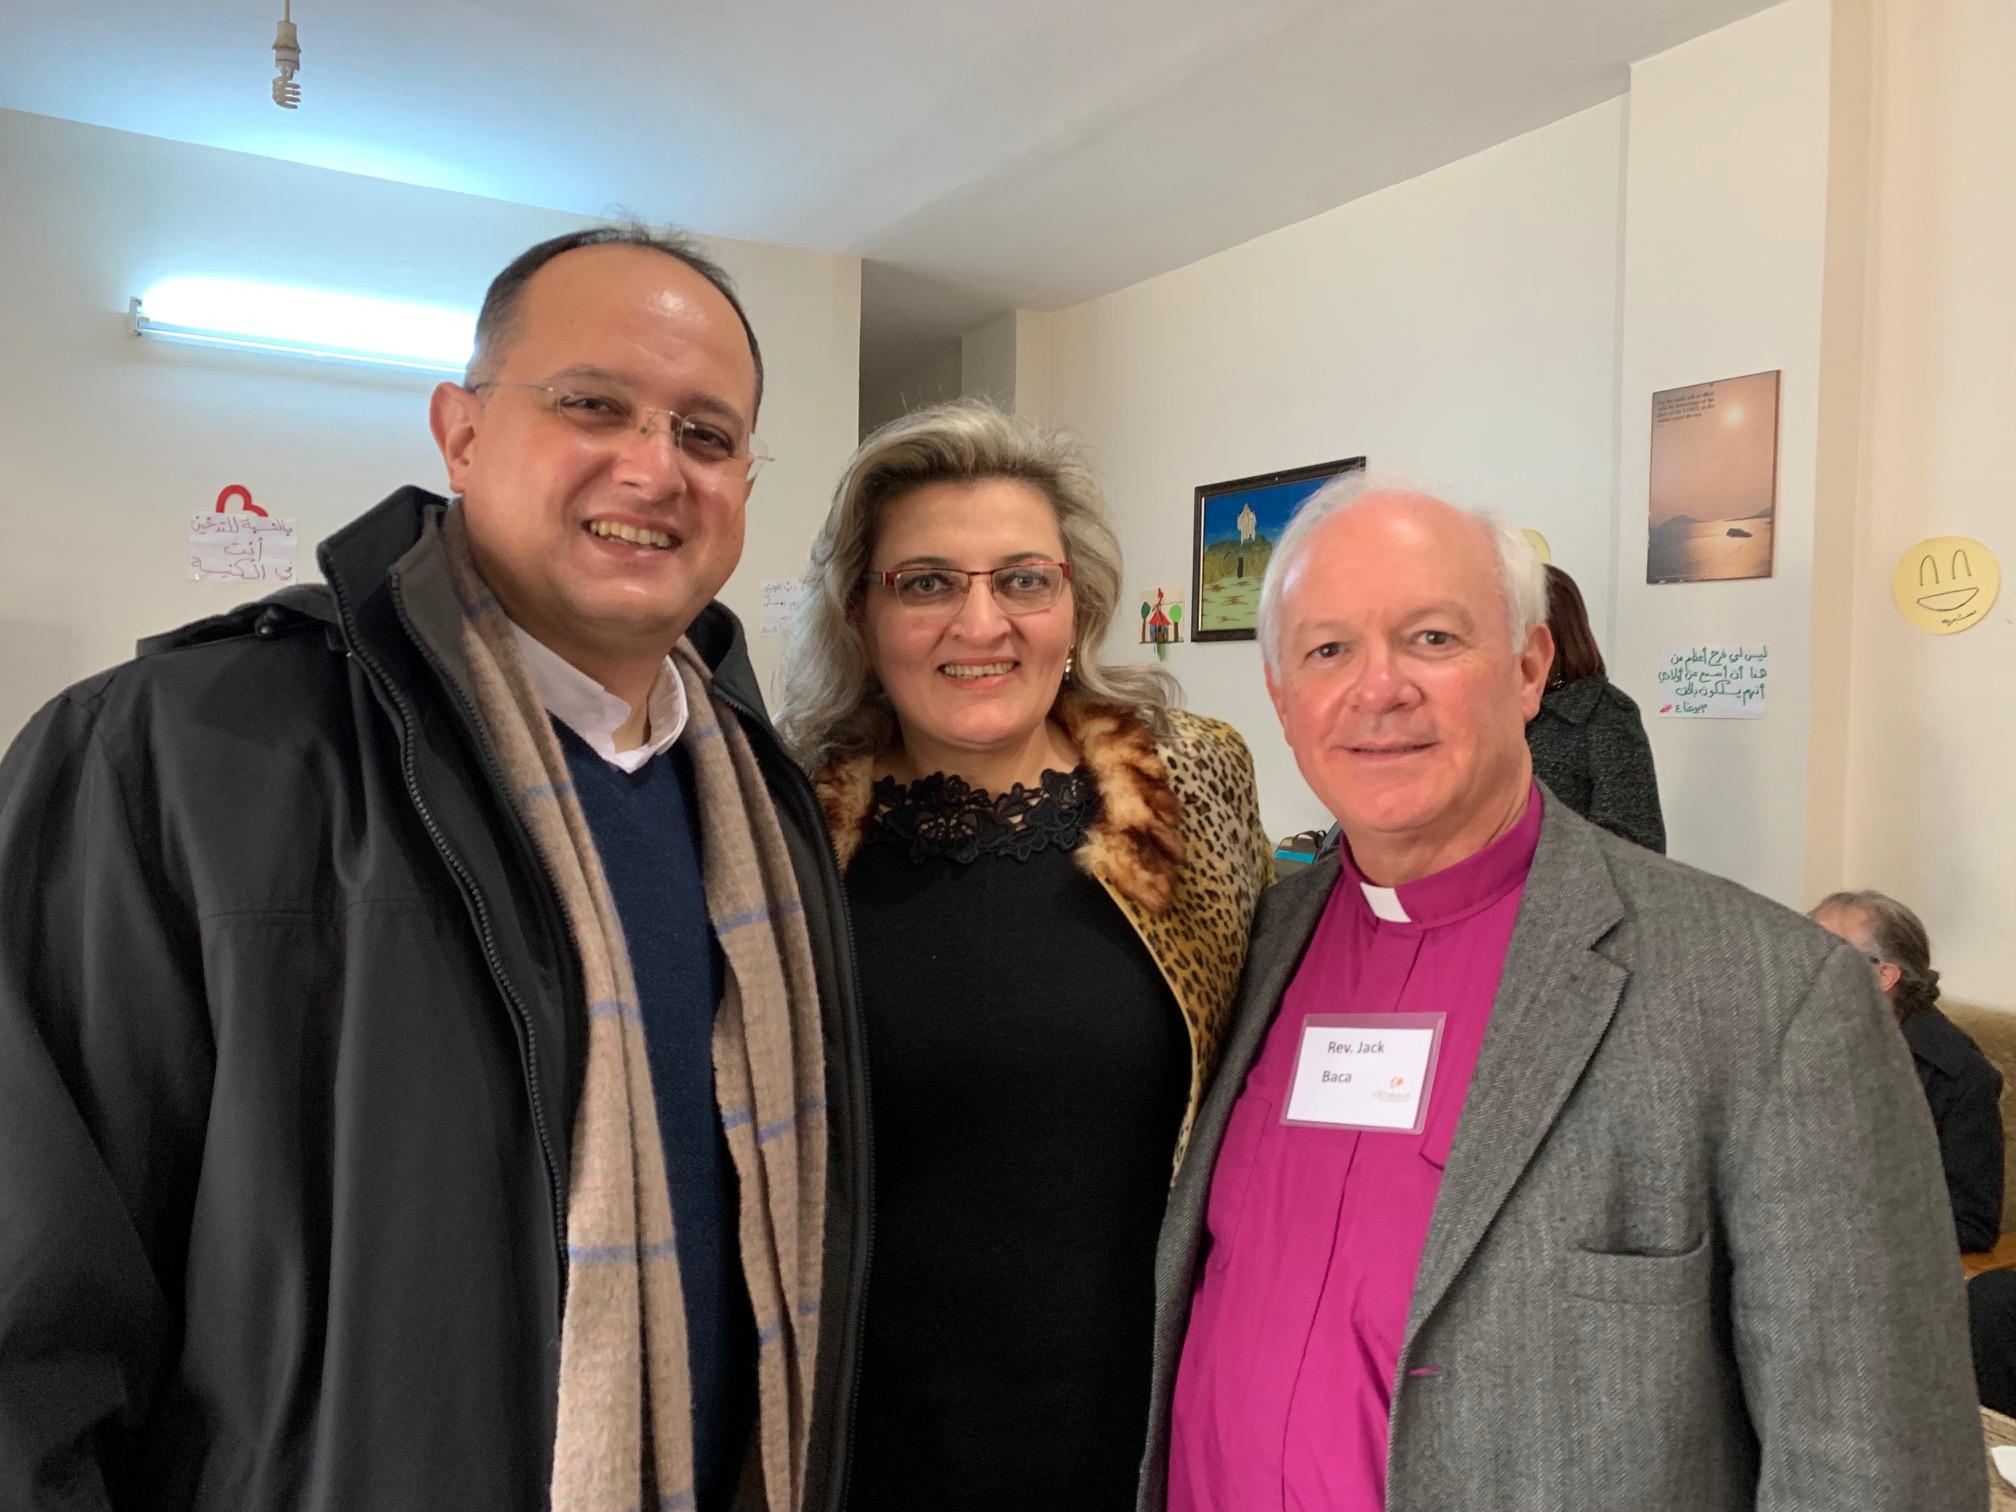 Rev. Salam Hanna, Georgette Mq, Rev. Jack Baca